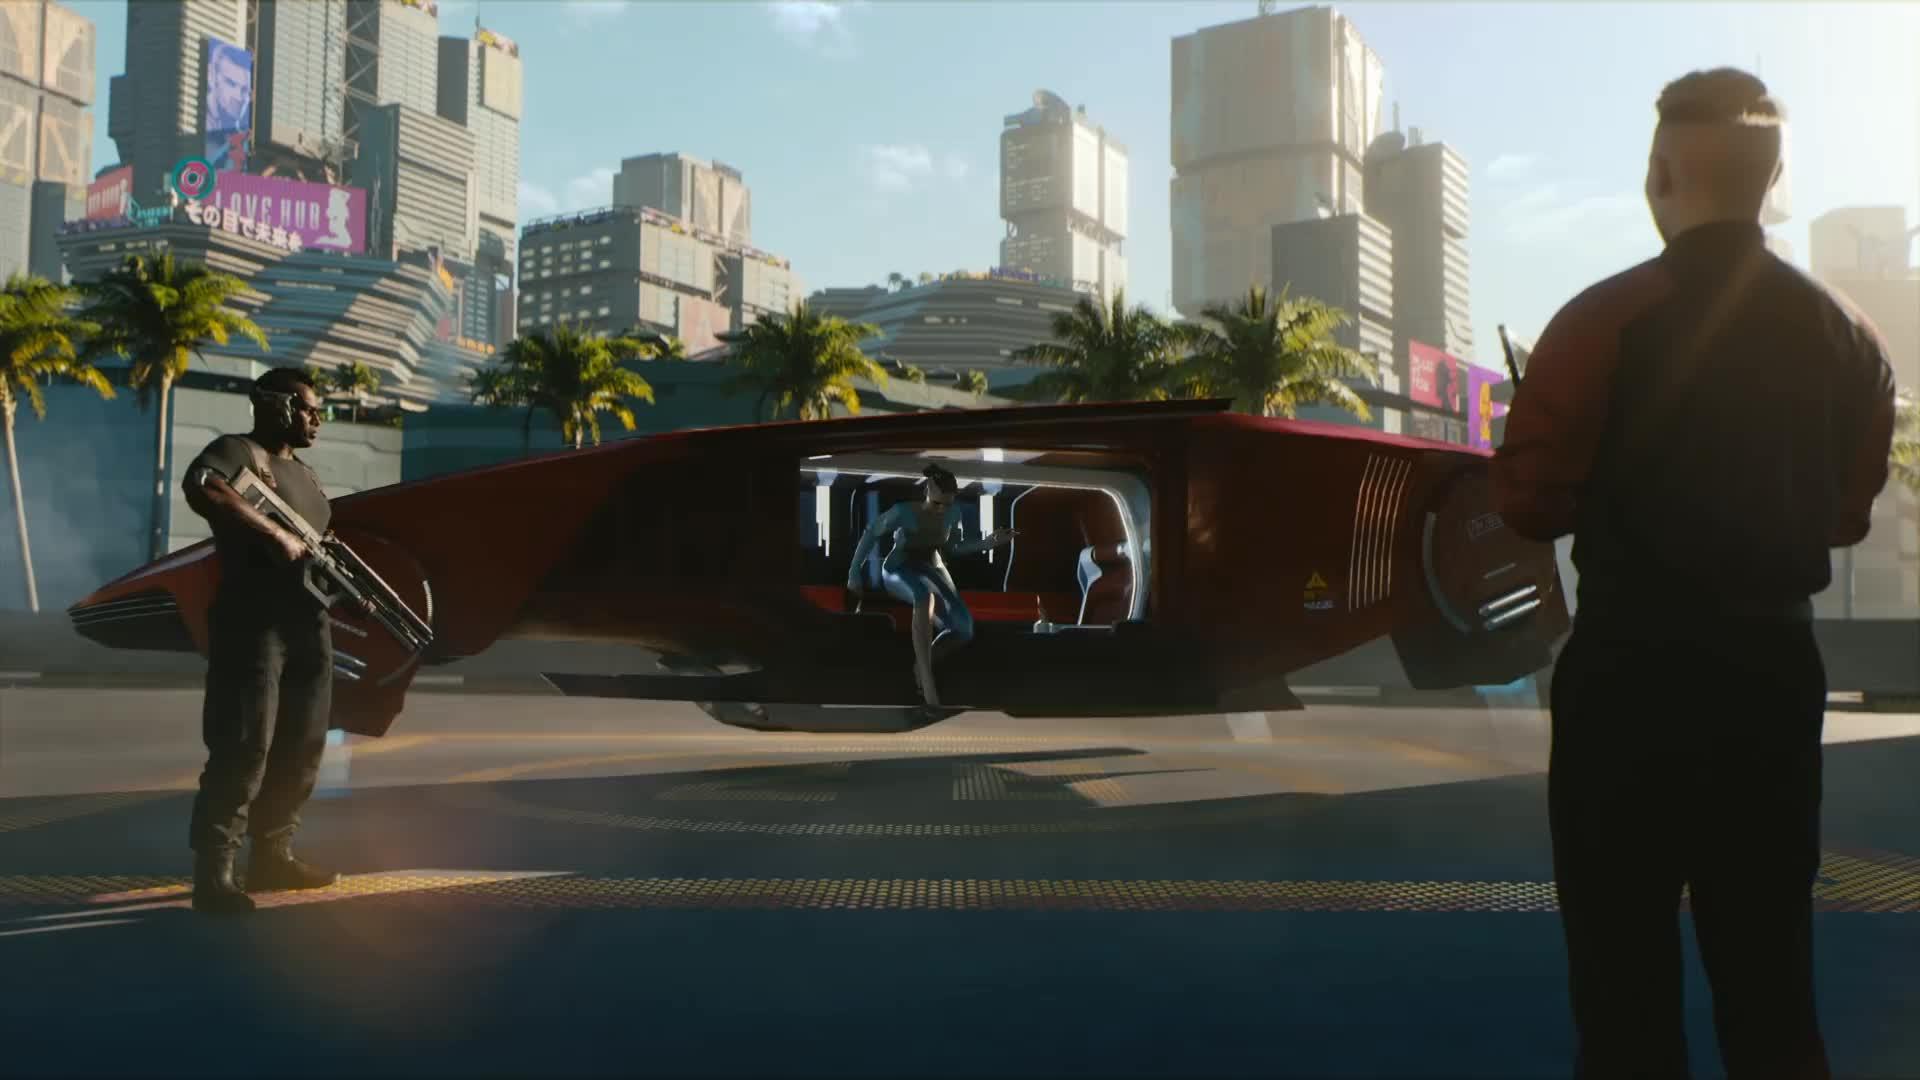 2077, cyberpunk, cyberpunk 2077, Cyberpunk 2077 Ship Landing GIFs